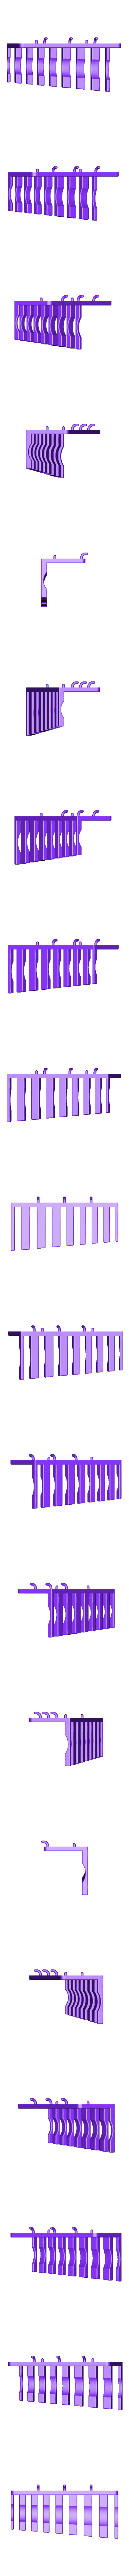 Part_2.stl Download free STL file XXL Combination Spanner Set 26pcs metric 6-32 mm Wall Holder 016 I for screws or peg board • 3D printable model, Wiesemann1893